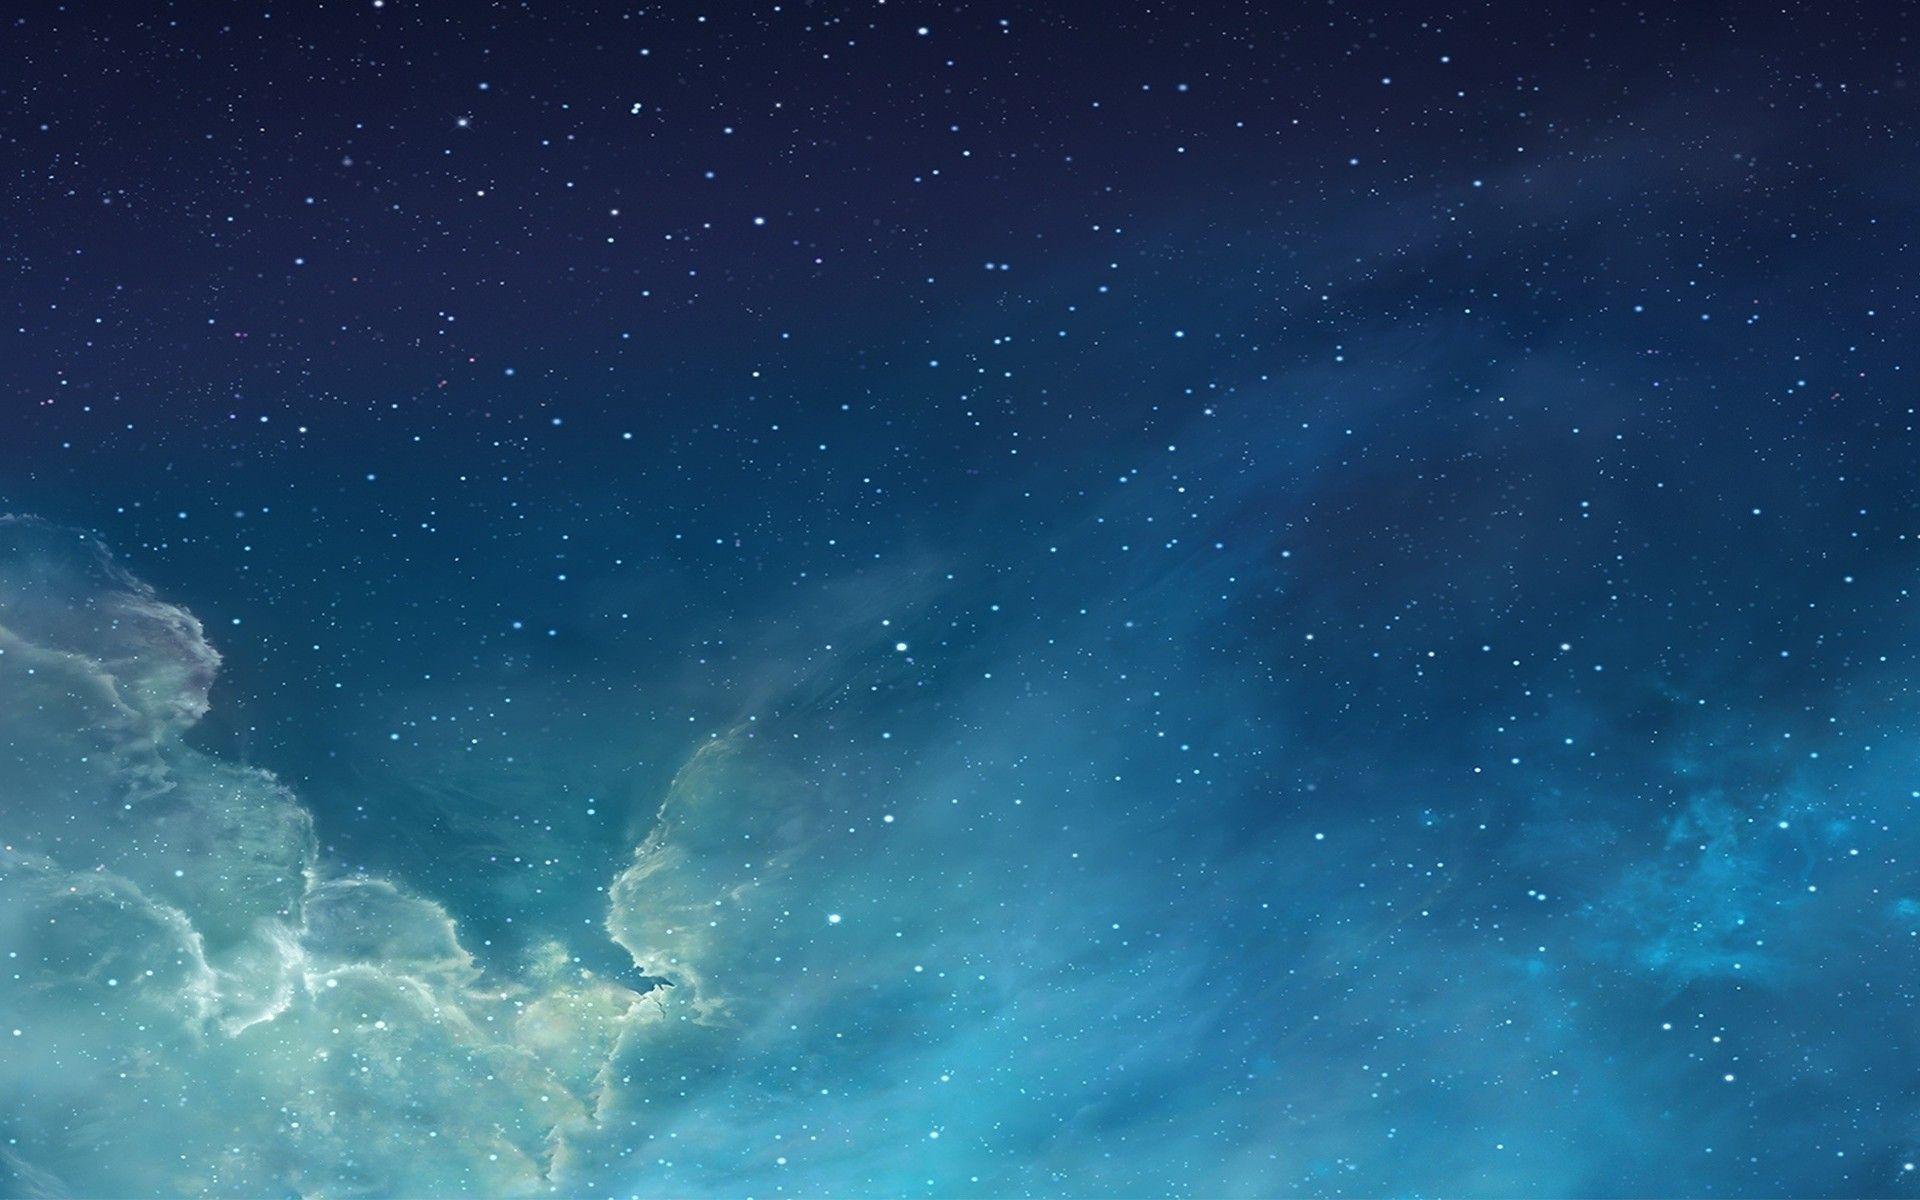 star wallpaper star sky wallpapers wallpaper cave